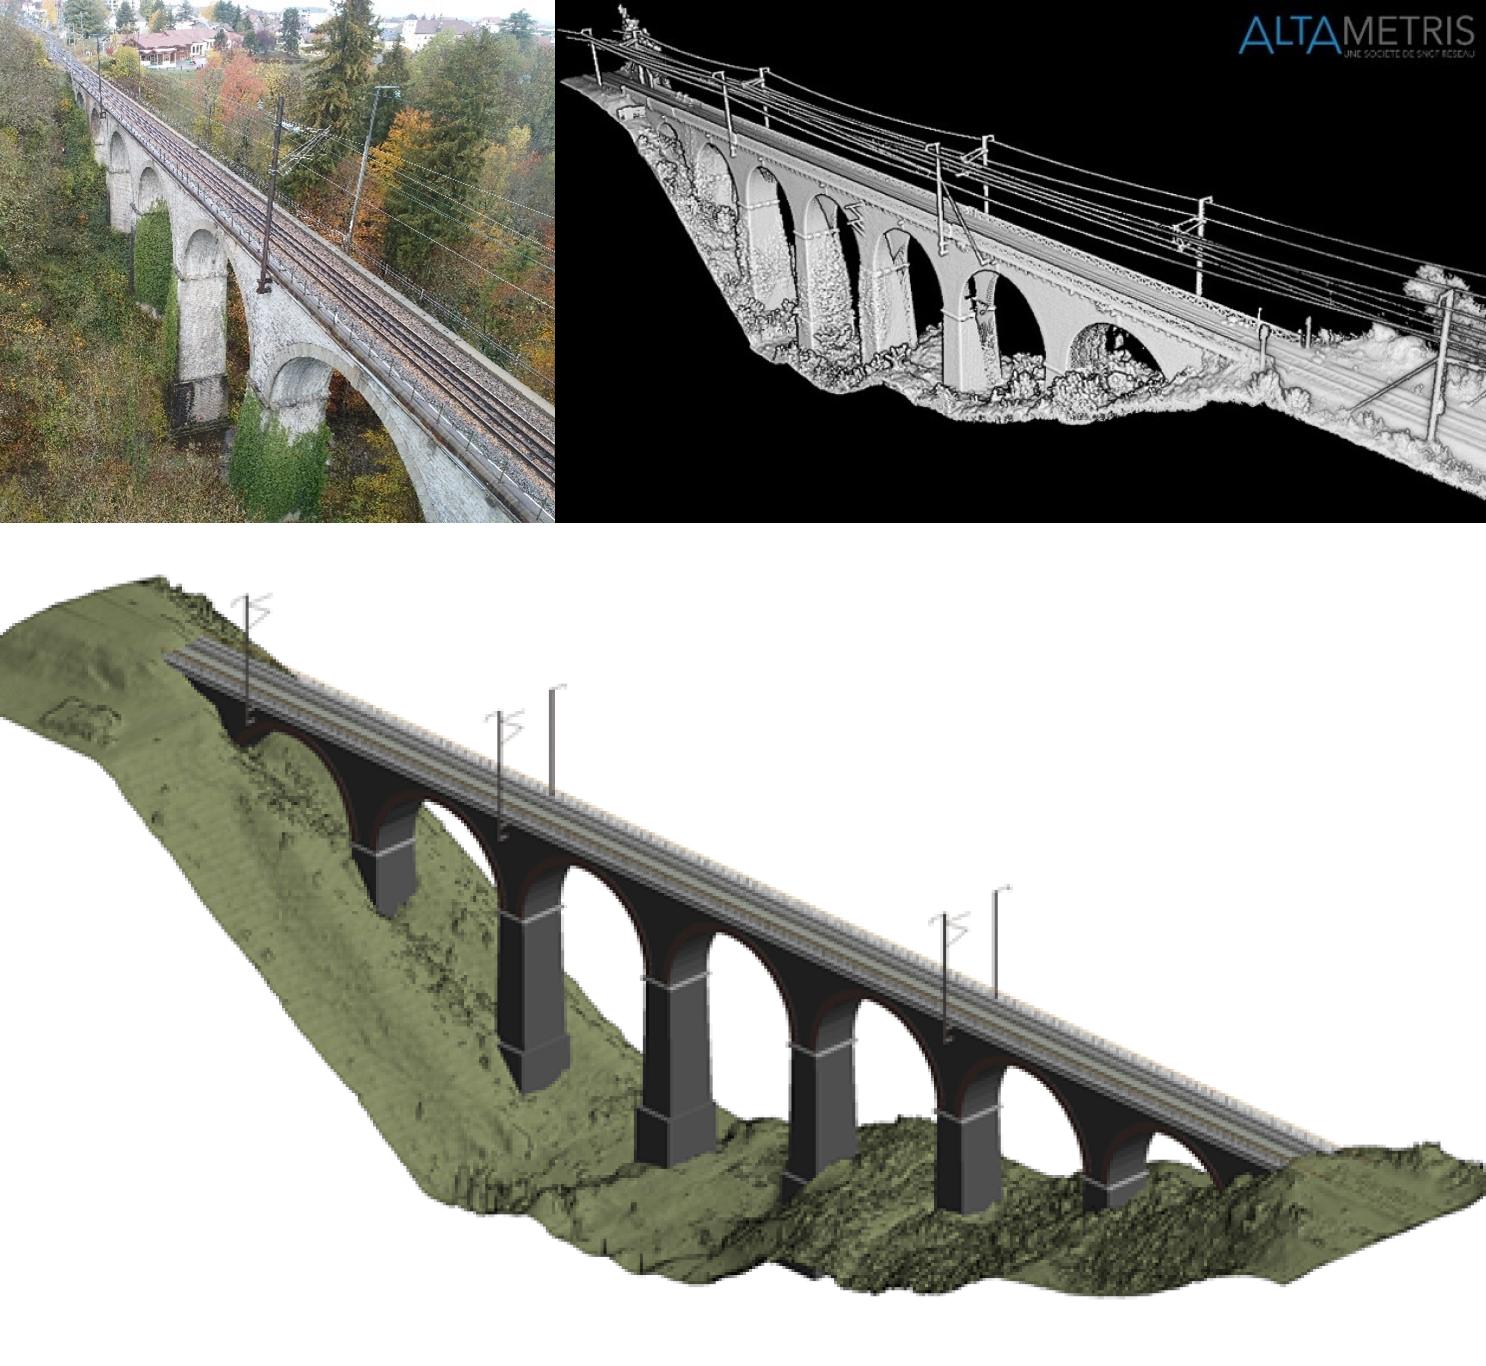 Modélisation 3D Altametris